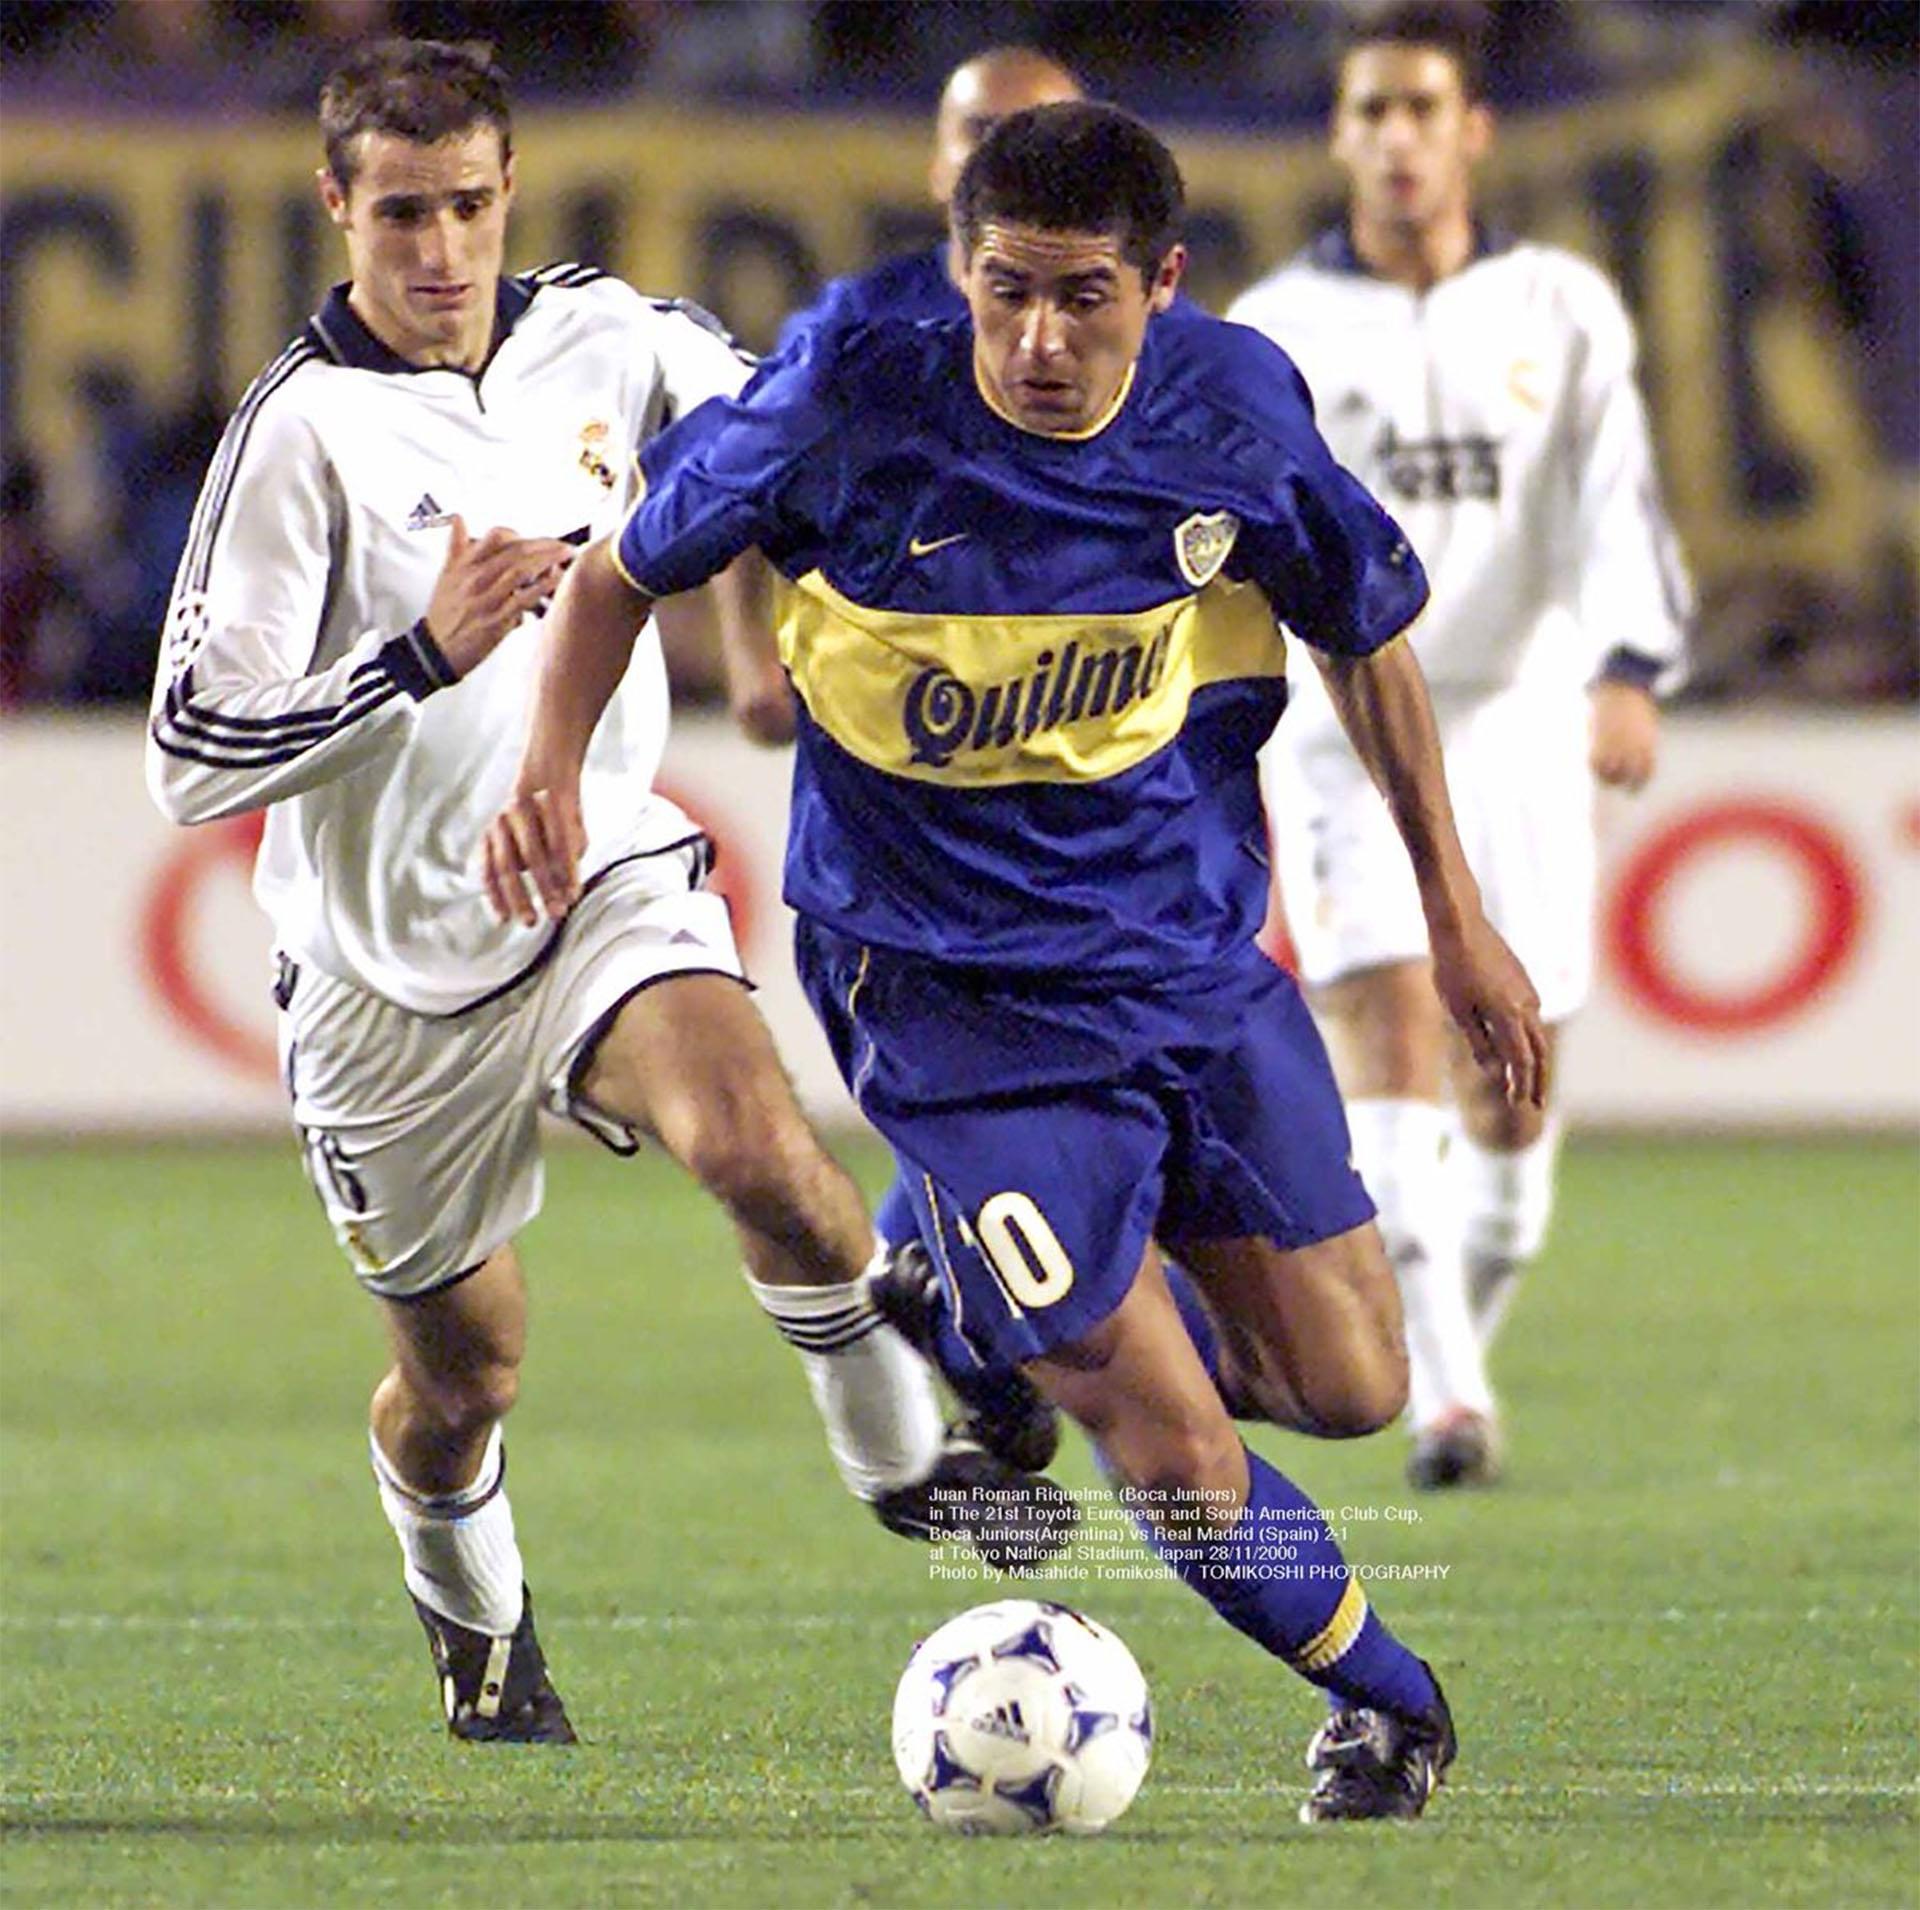 Juan Román Riquelme en la Intercontinental que Boca le ganó a Real Madrid (Photo by Masahide Tomikoshi / TOMIKOSHI PHOTOGRAPHY @tphoto2005)